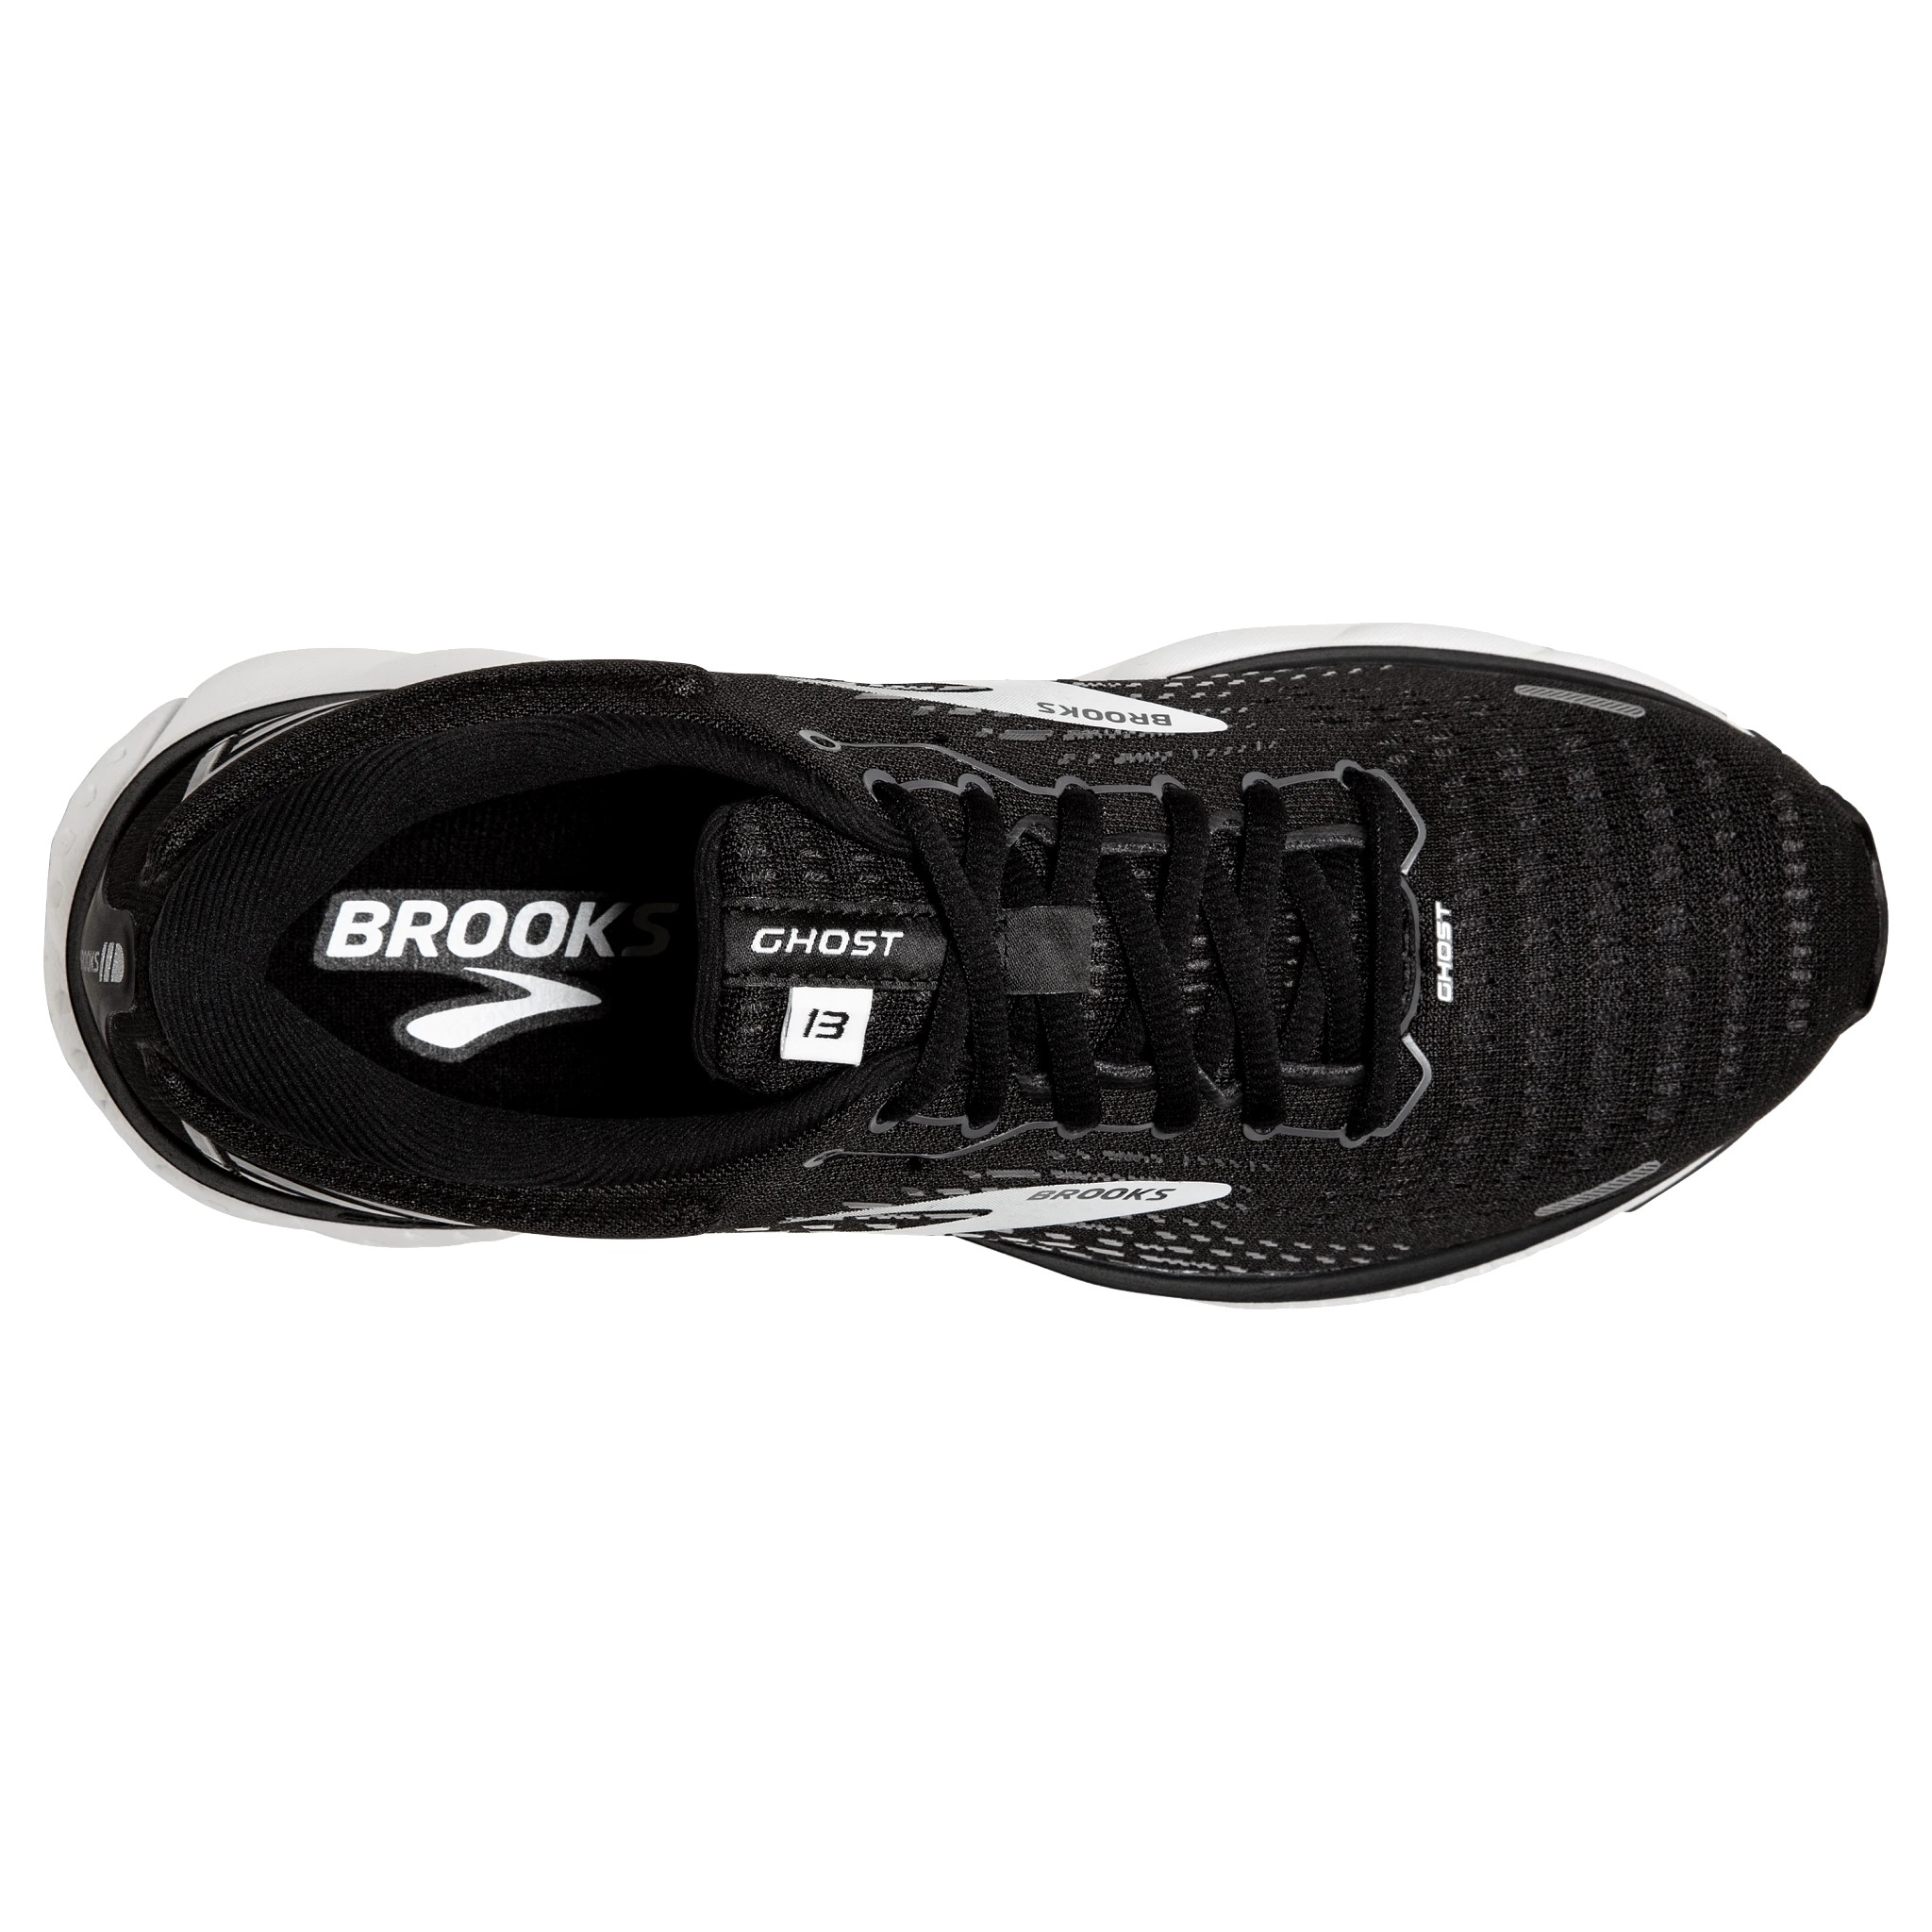 Brooks Ghost 13 - Women's